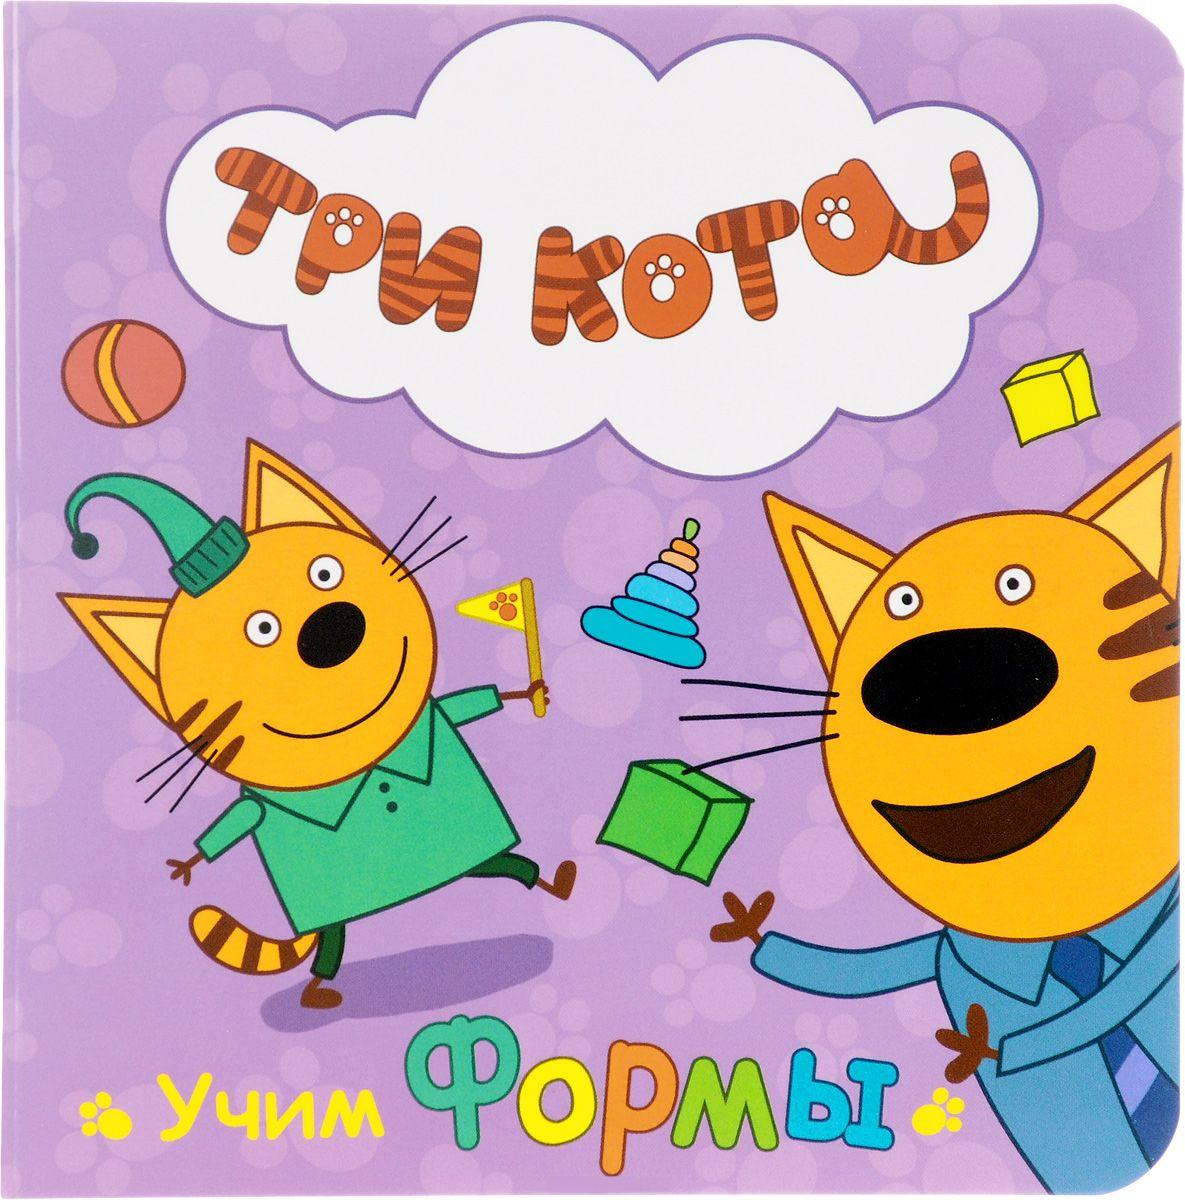 Книга - Три кота - Учим формыОбучающие книги. Книги с картинками<br>Книга - Три кота - Учим формы<br>